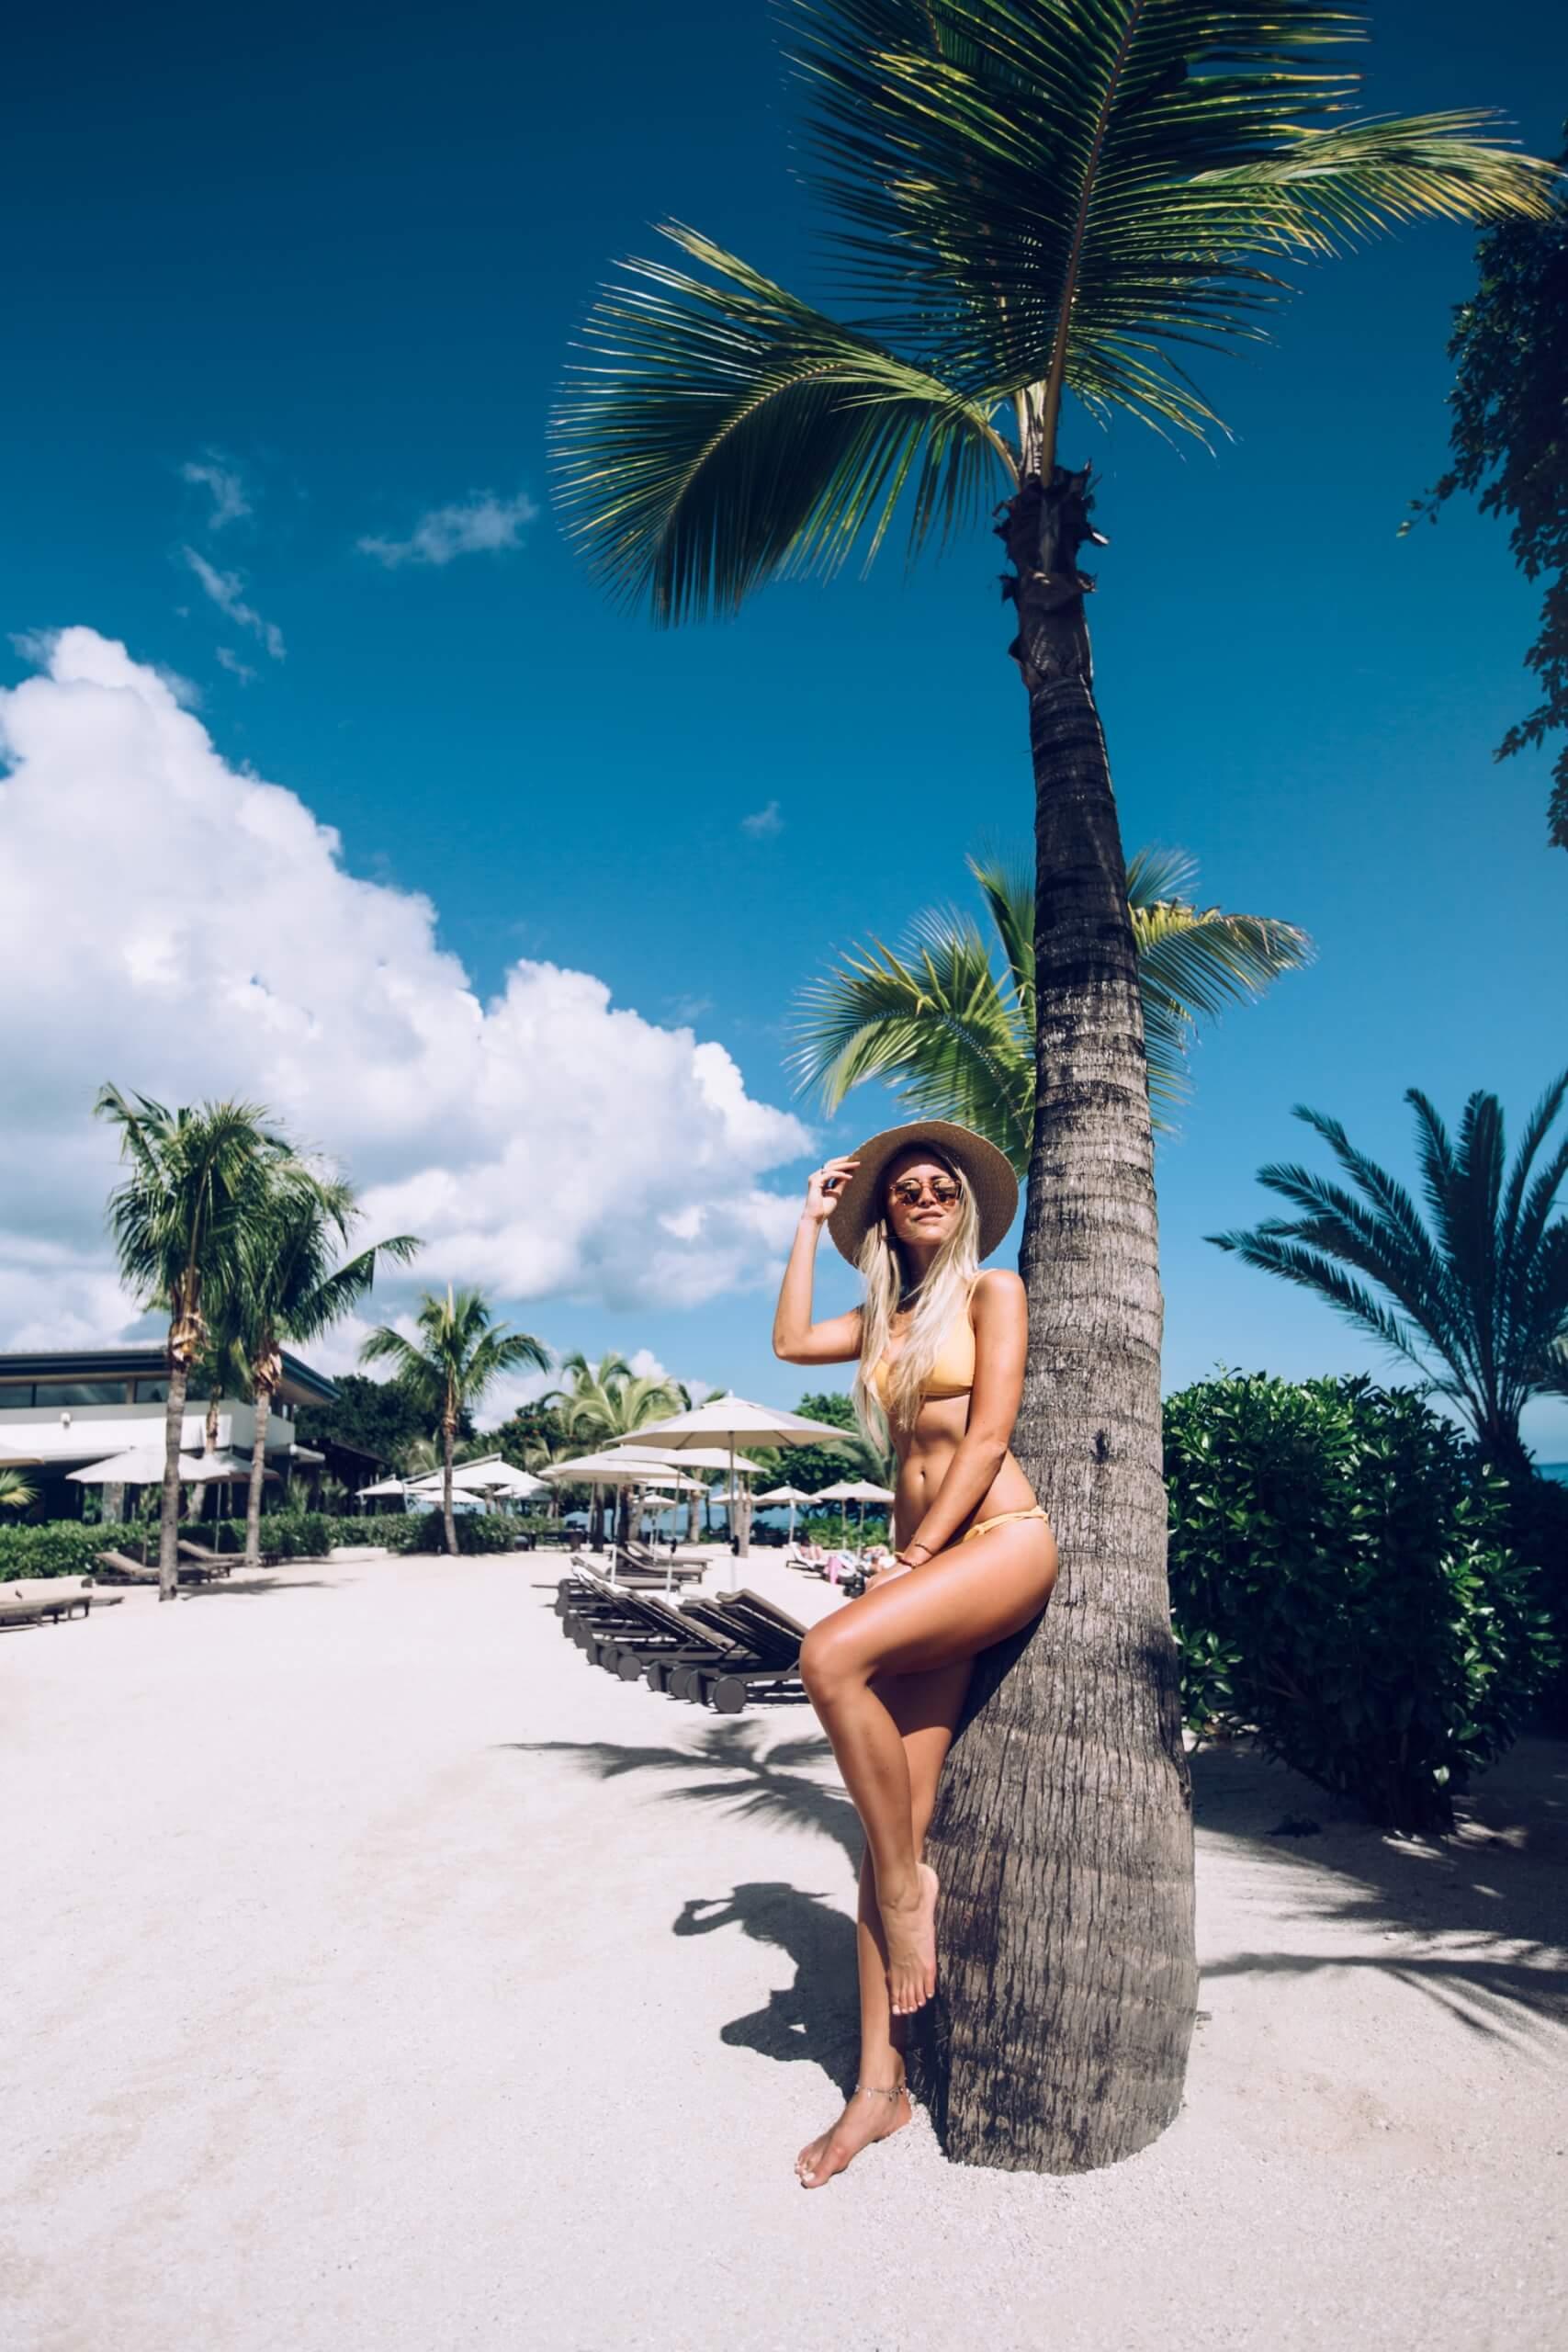 Janni Mauritius by Fabian Wester-6